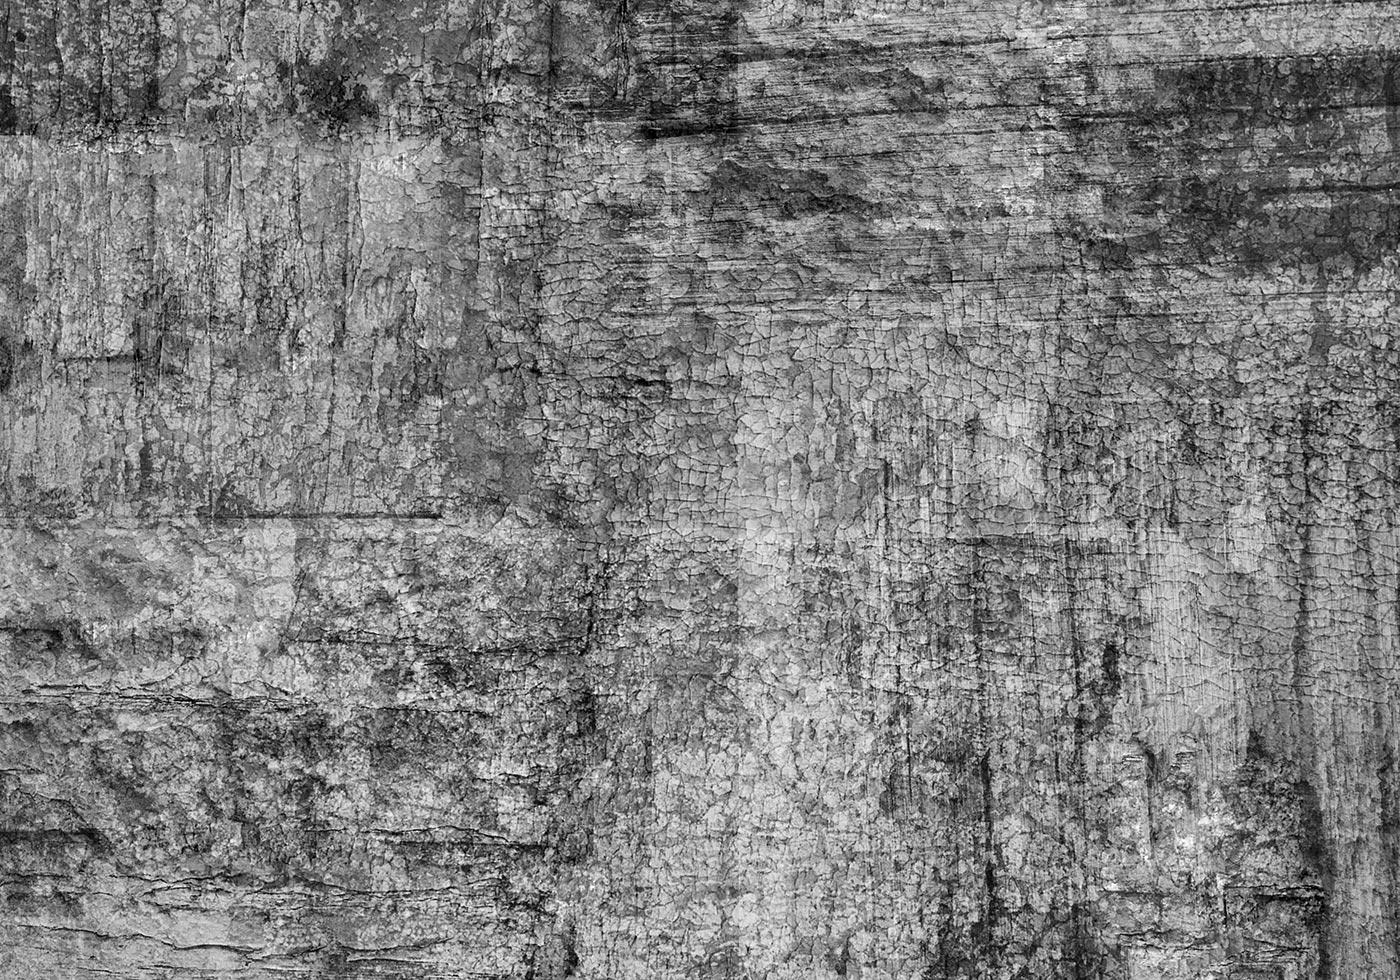 Mind Cracked Paint Texture Free Photoshop Textures At Cracked Paint Texture Free Photoshop Textures At Cracked Paint Texture Photoshop Cracked Paint Texture Free dpreview Cracked Paint Texture